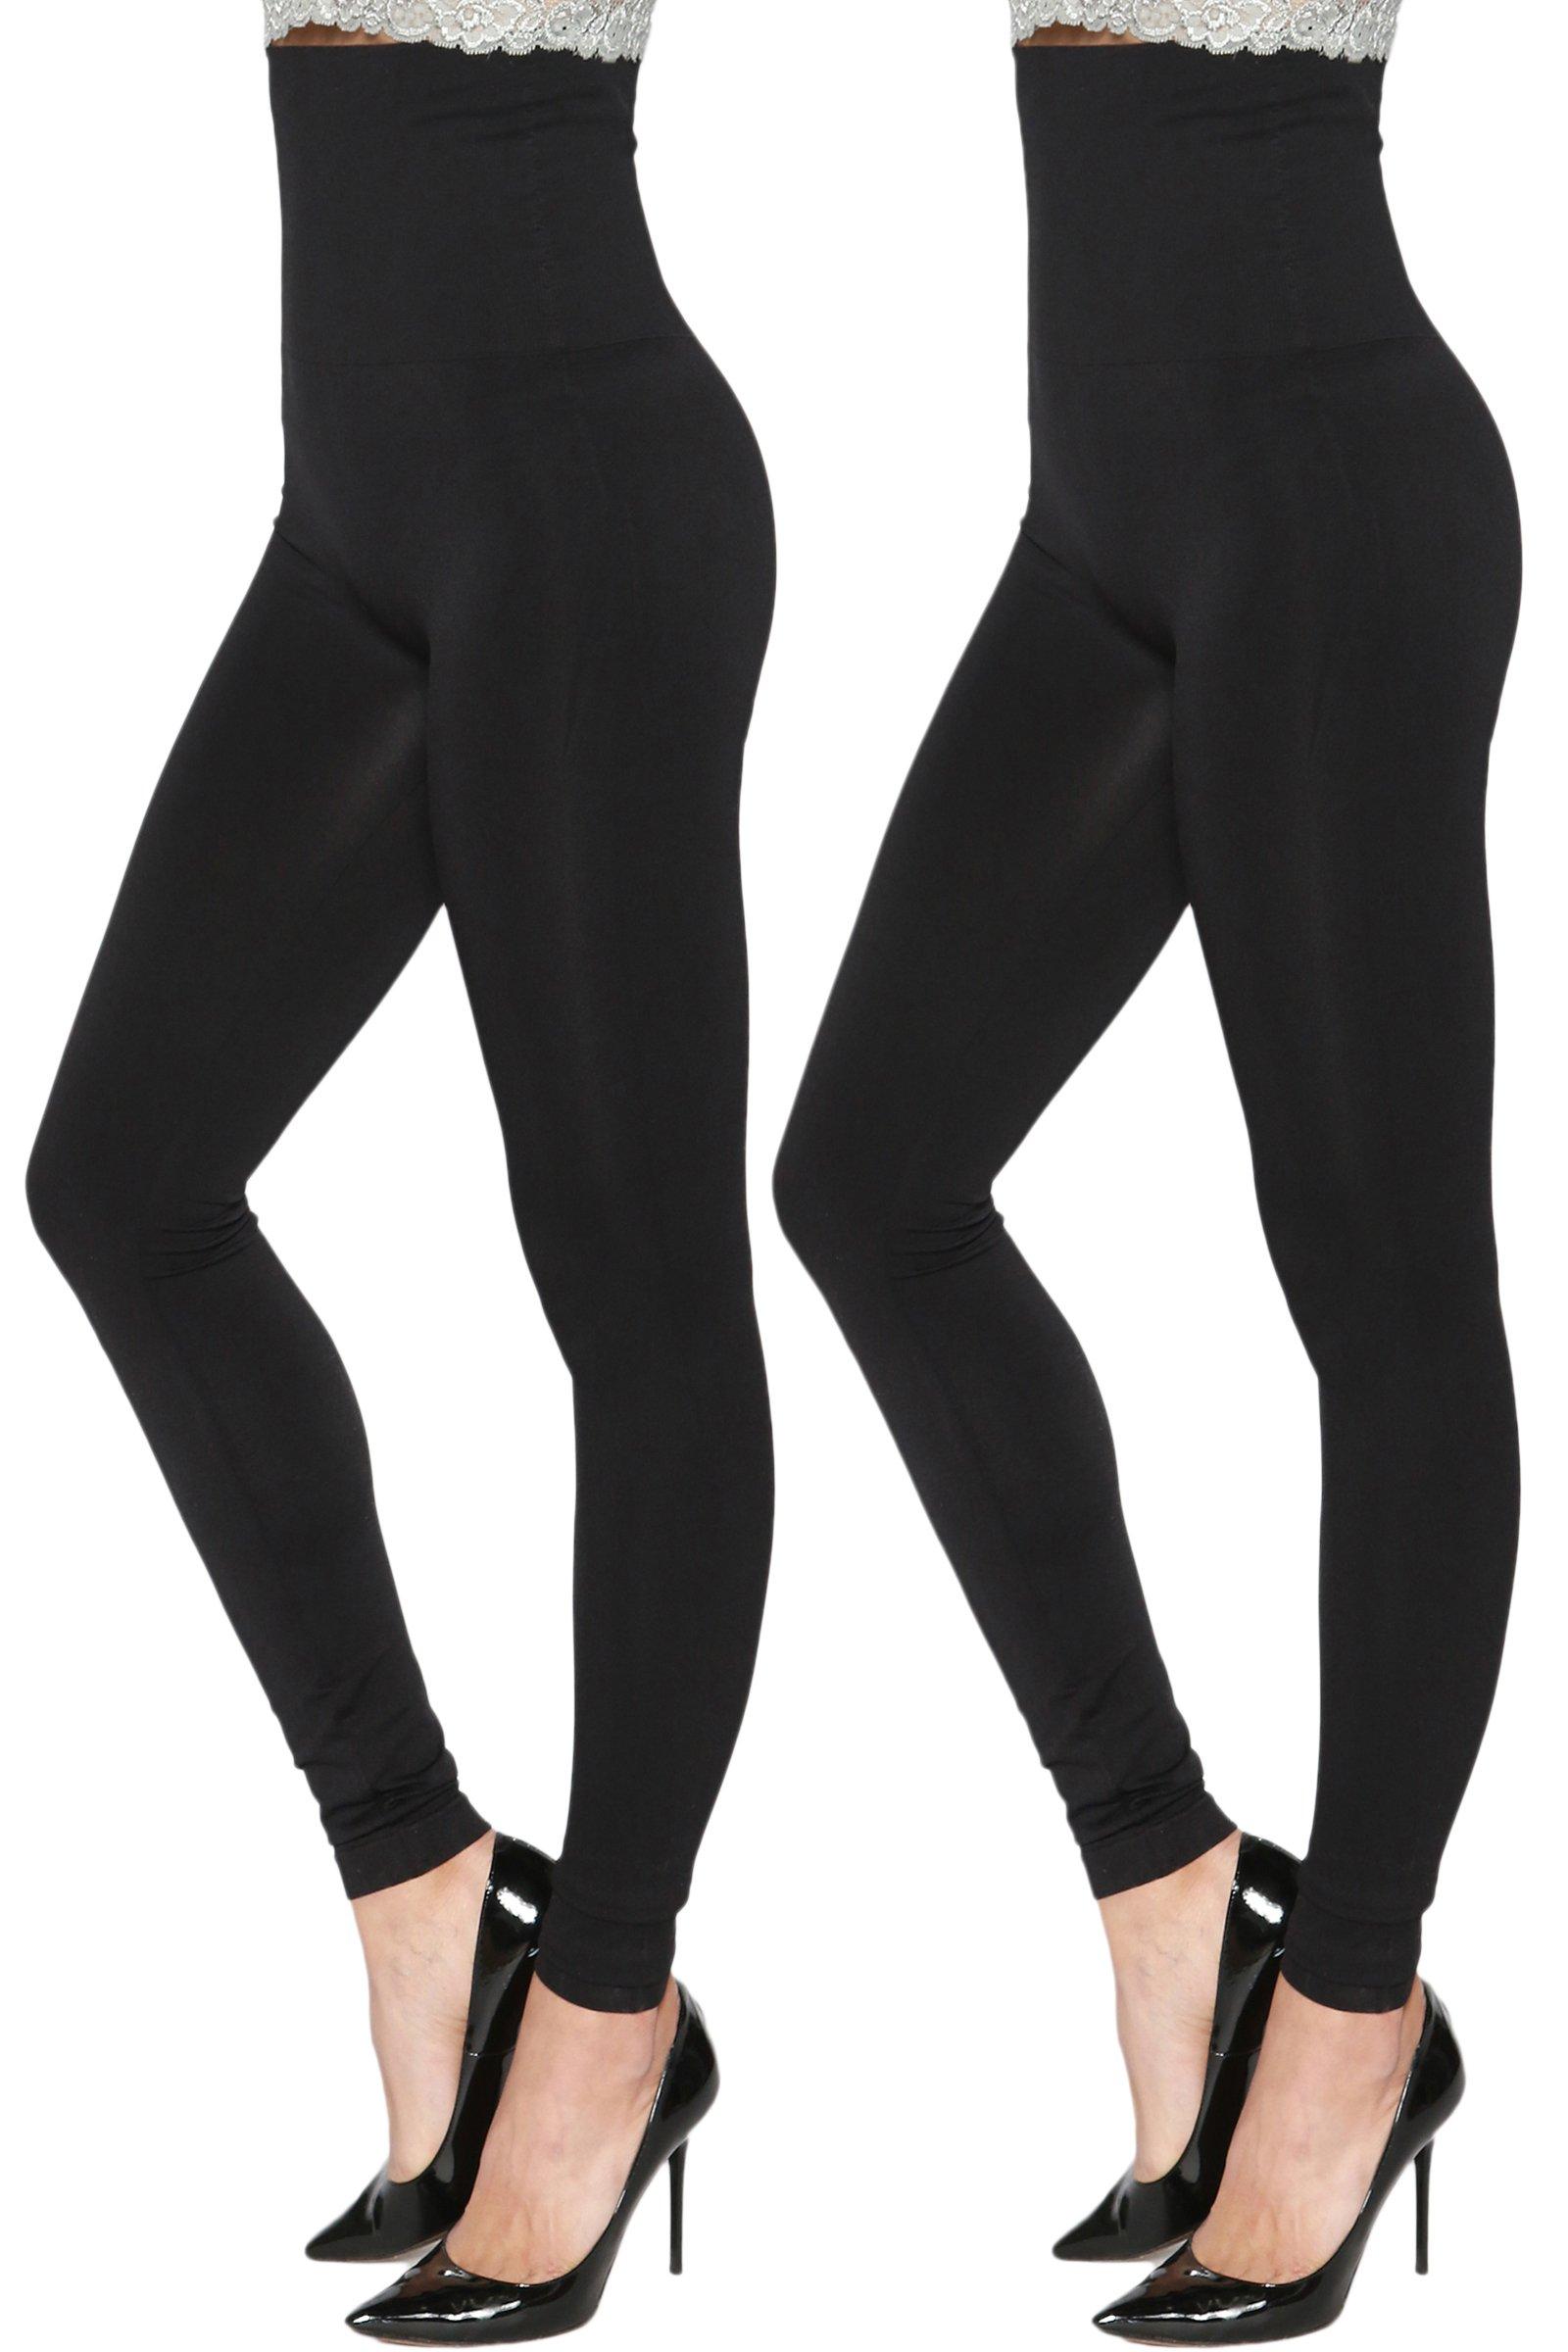 TheMogan Women's Empire Waist Tummy Compression High Waist Leggings 2 Pack Black